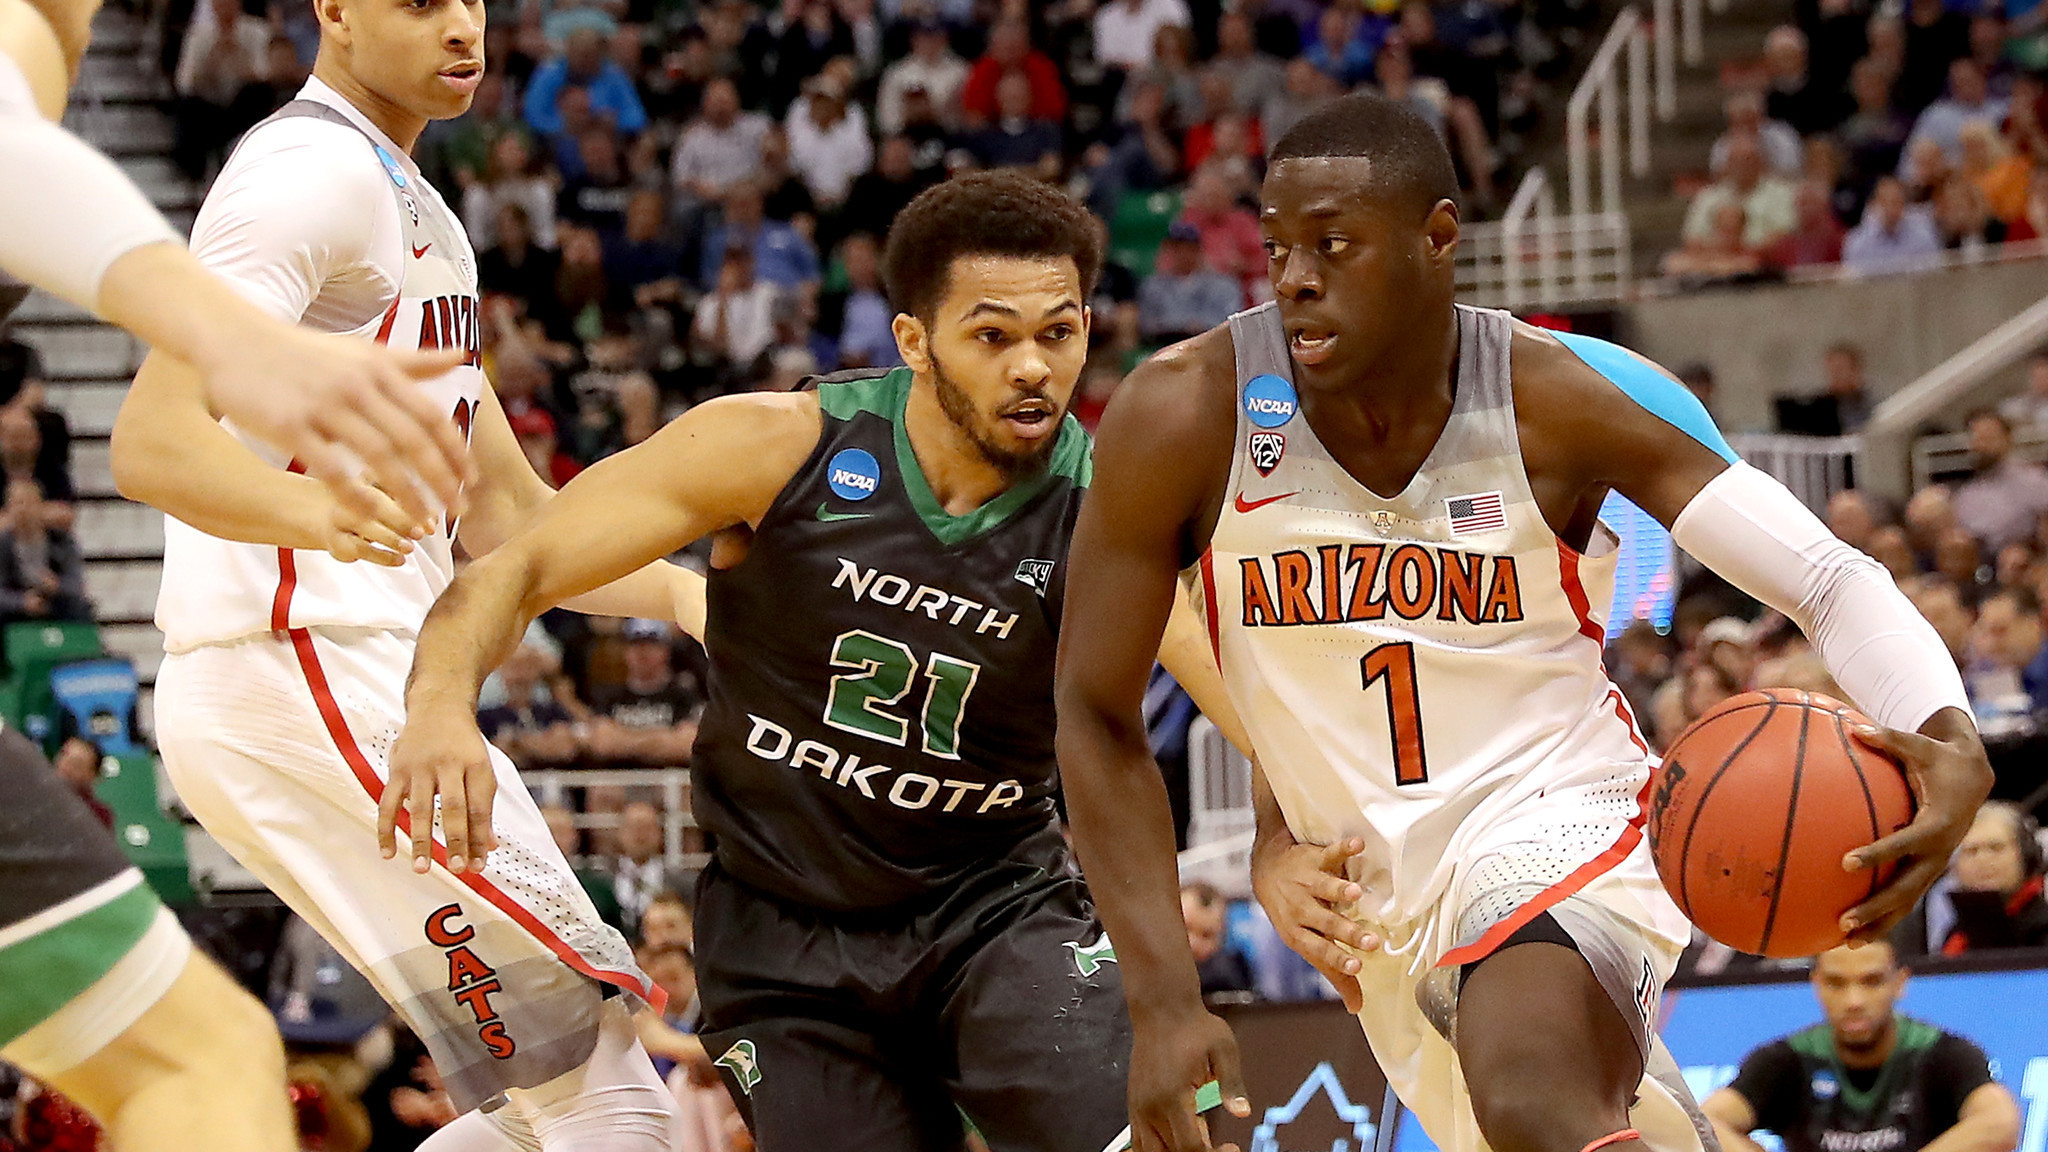 La-sp-college-basketball-report-20170522